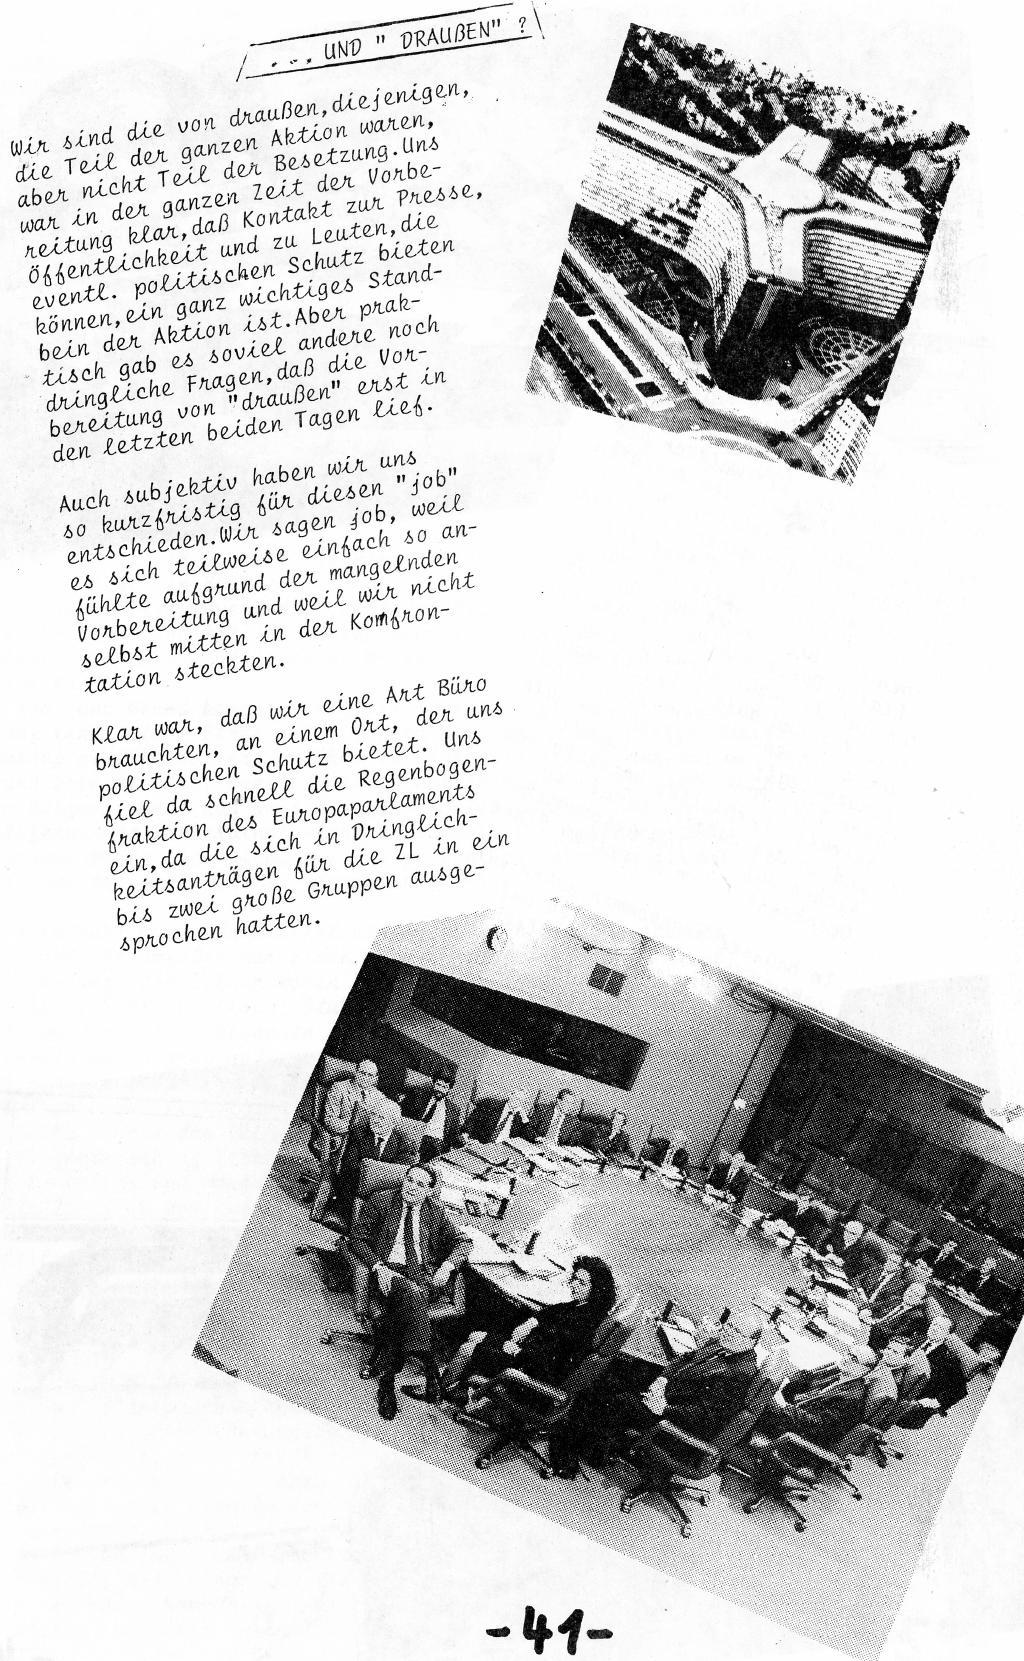 Belgien_Doku_Besetzung_EG_Kommission_1989_043